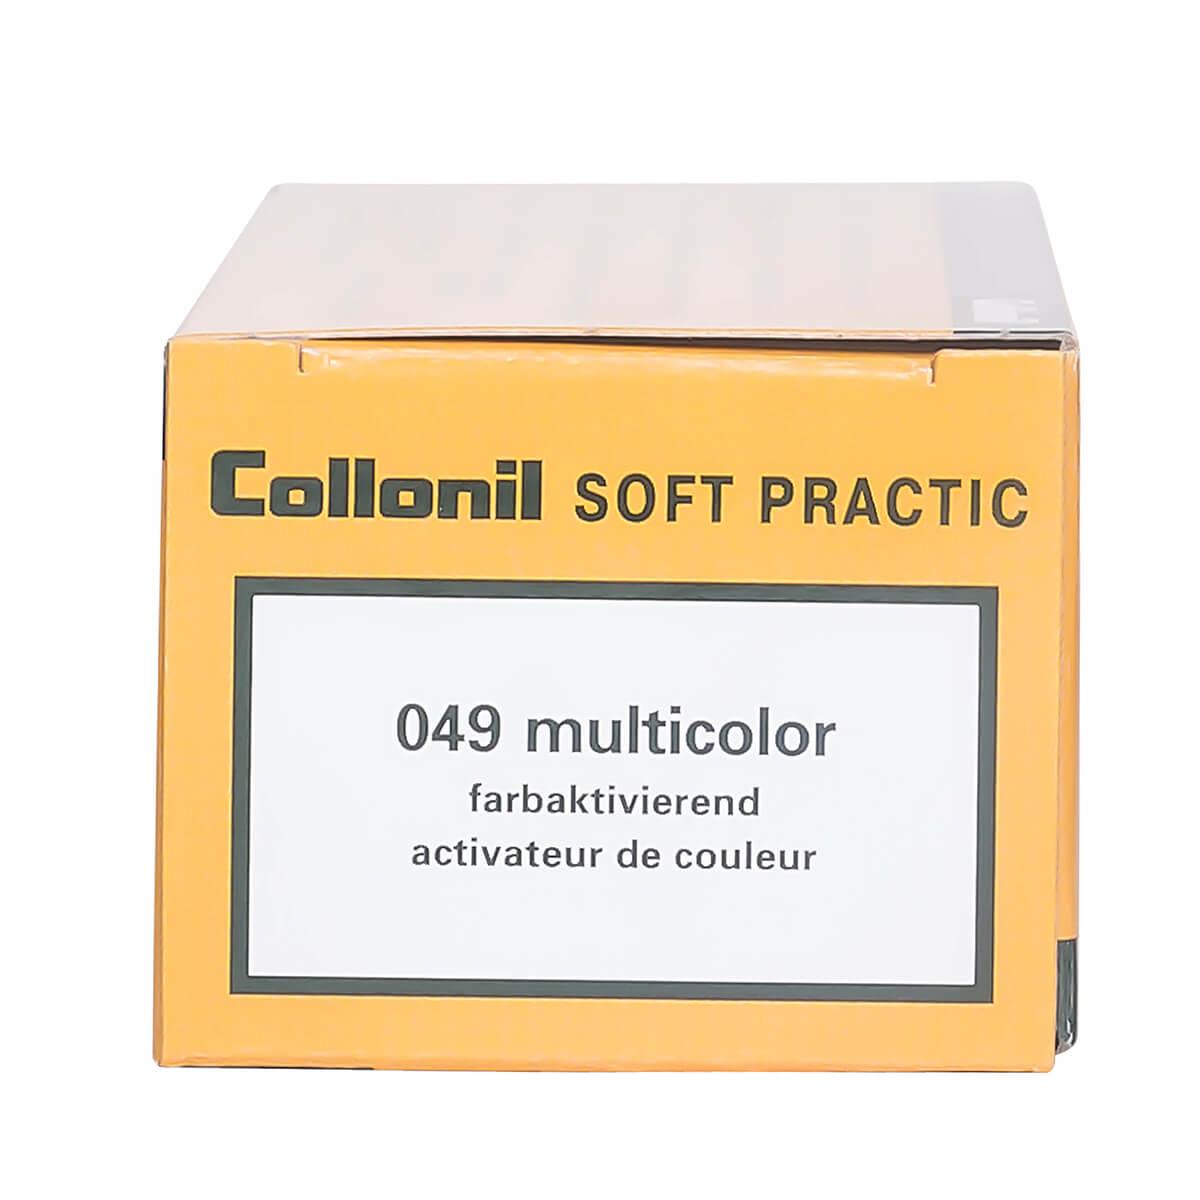 Collonil Creme  SOFT PRACTIC Multicolor